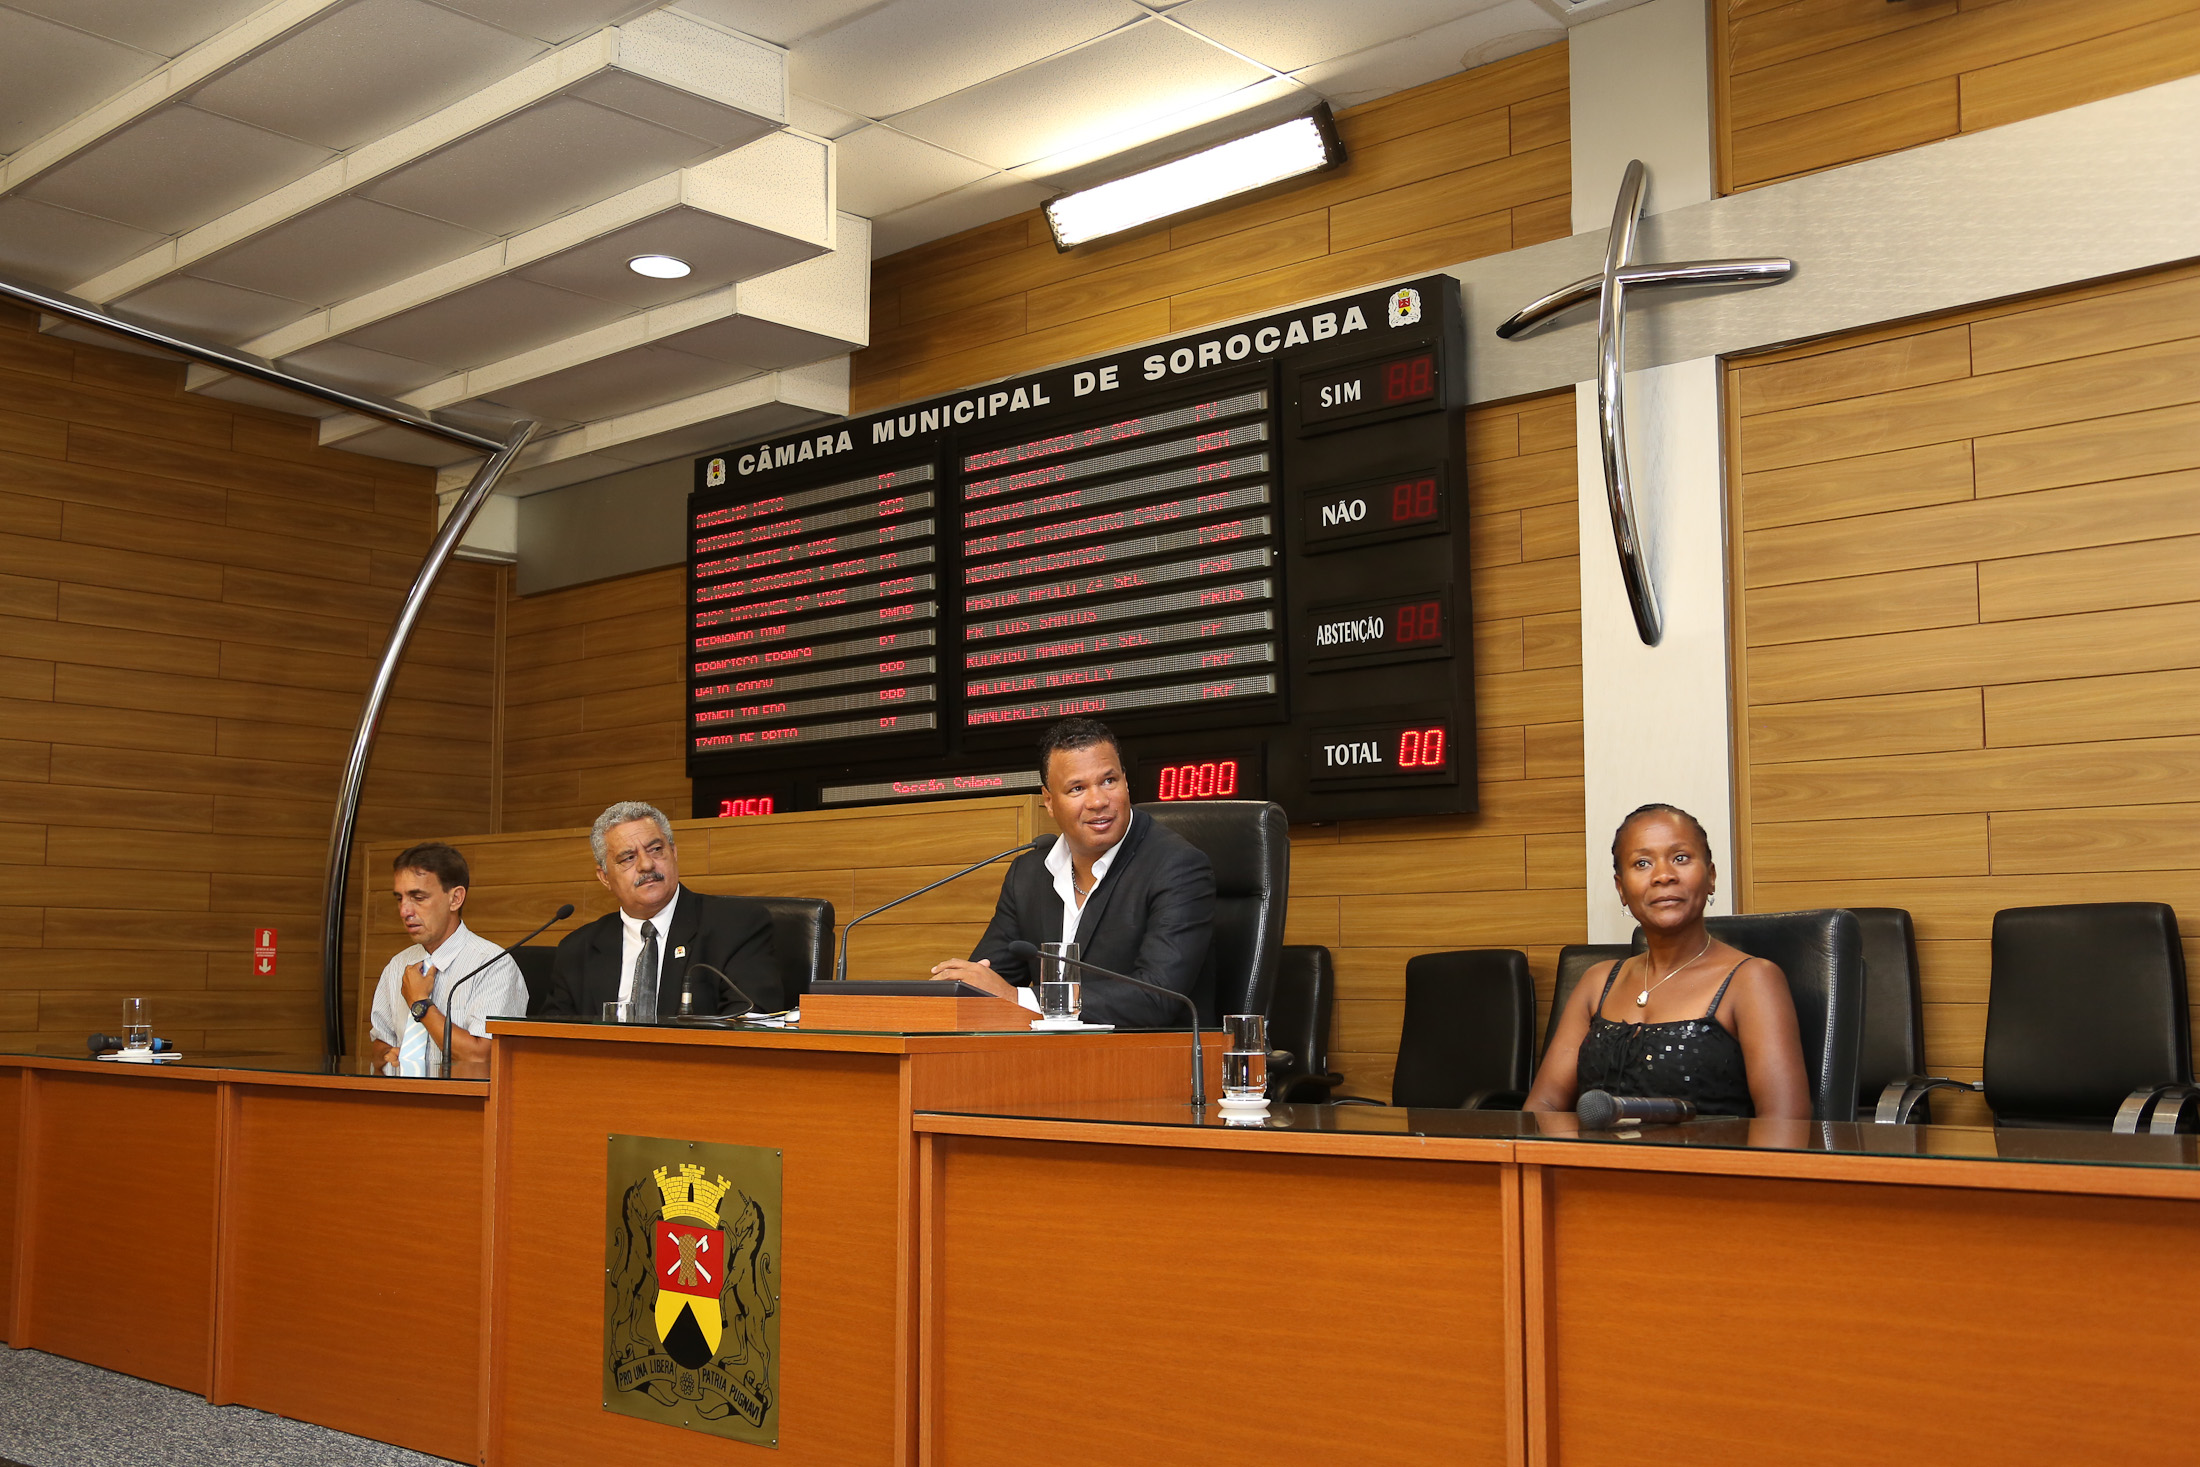 TCE Marli Oliveira e Valdinei Oliveira